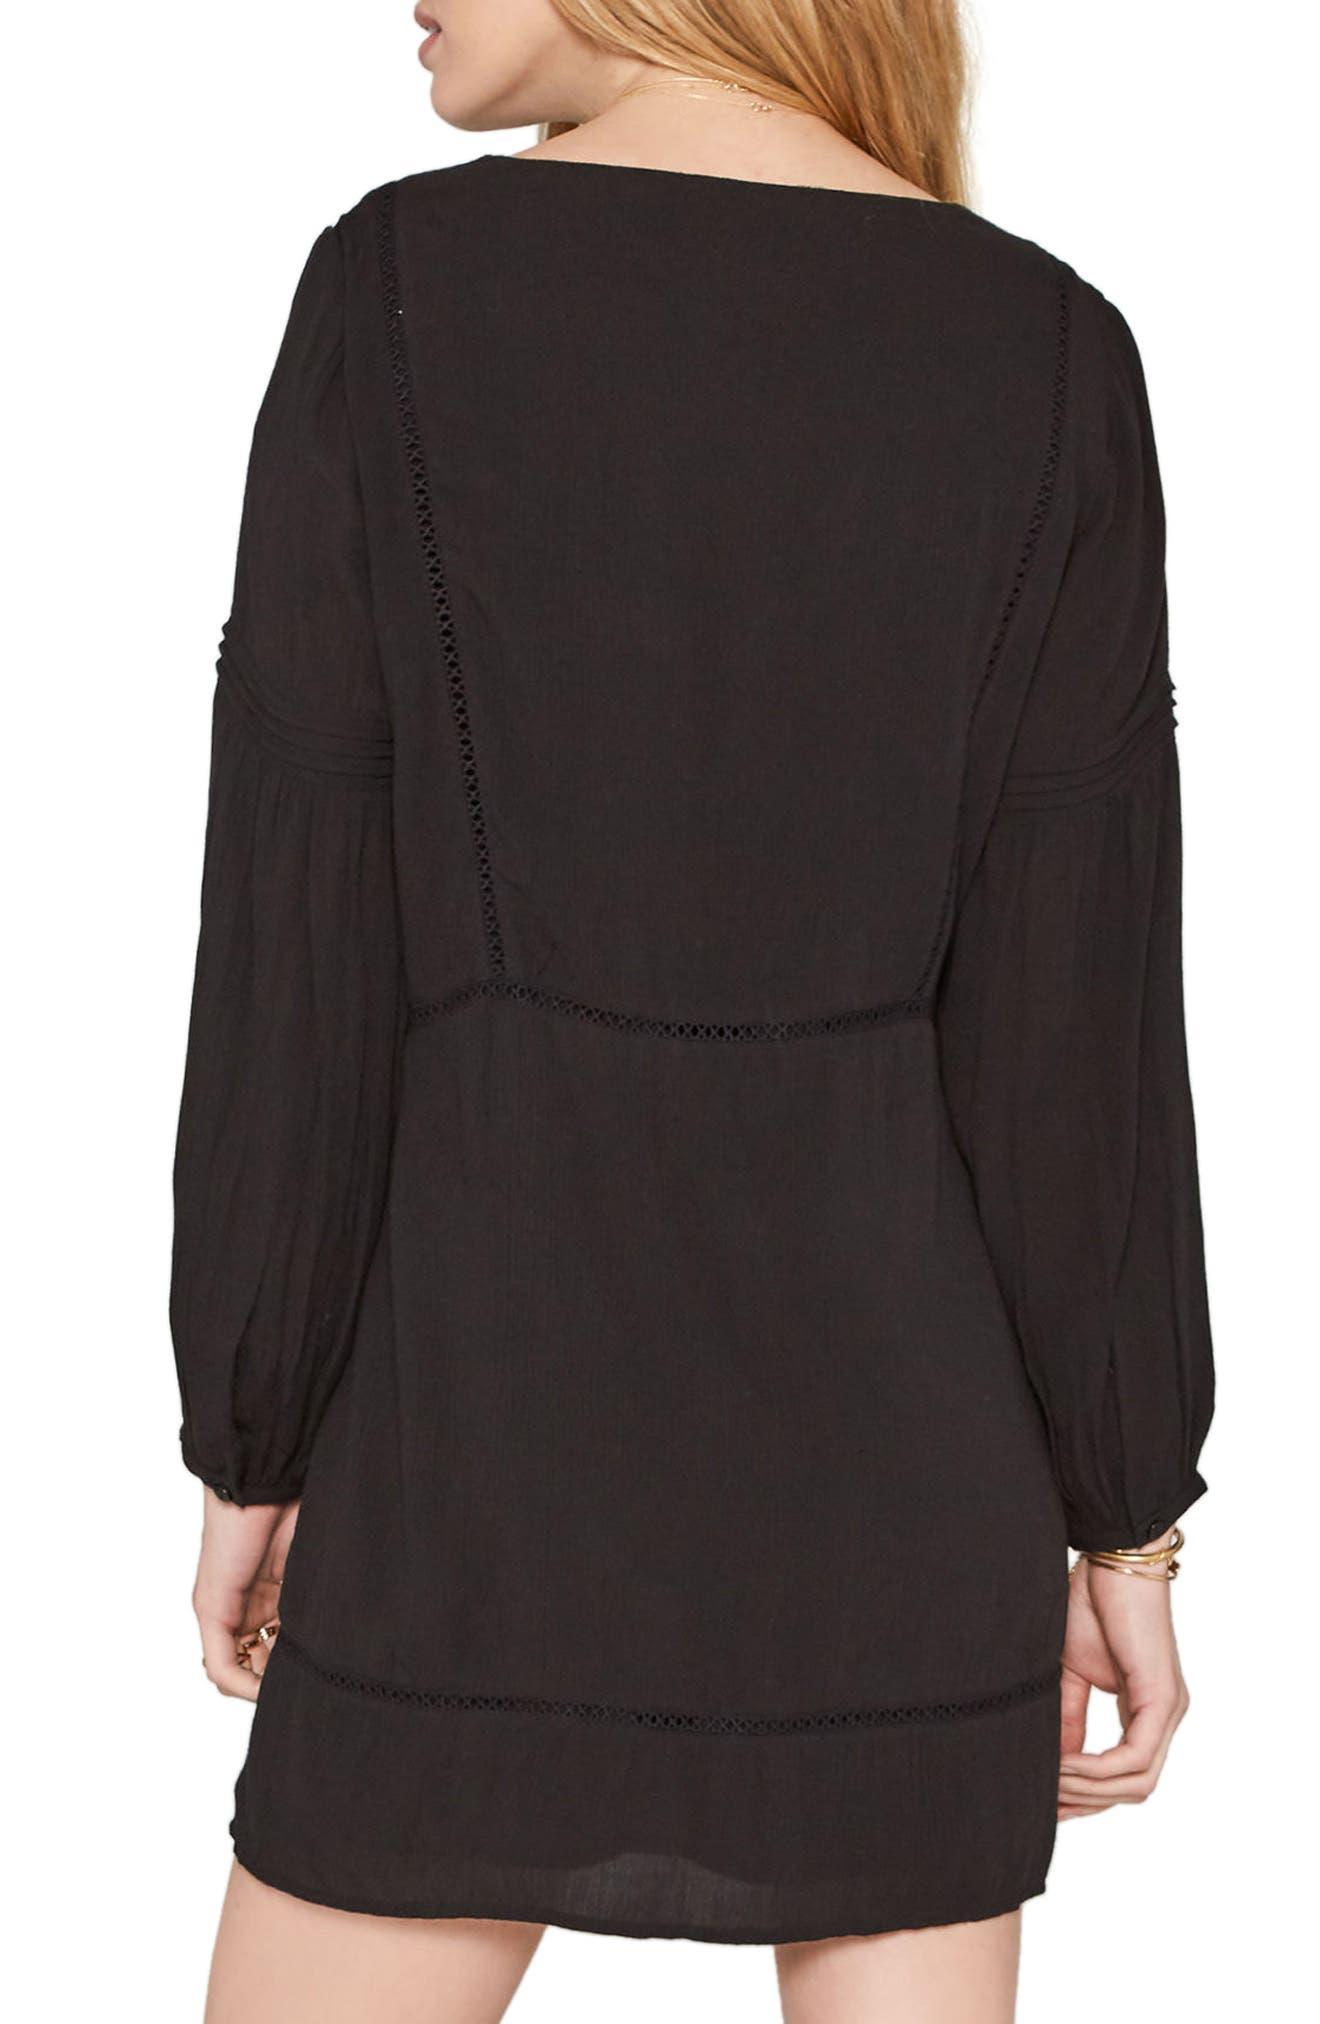 Berkley Dress,                             Alternate thumbnail 2, color,                             001